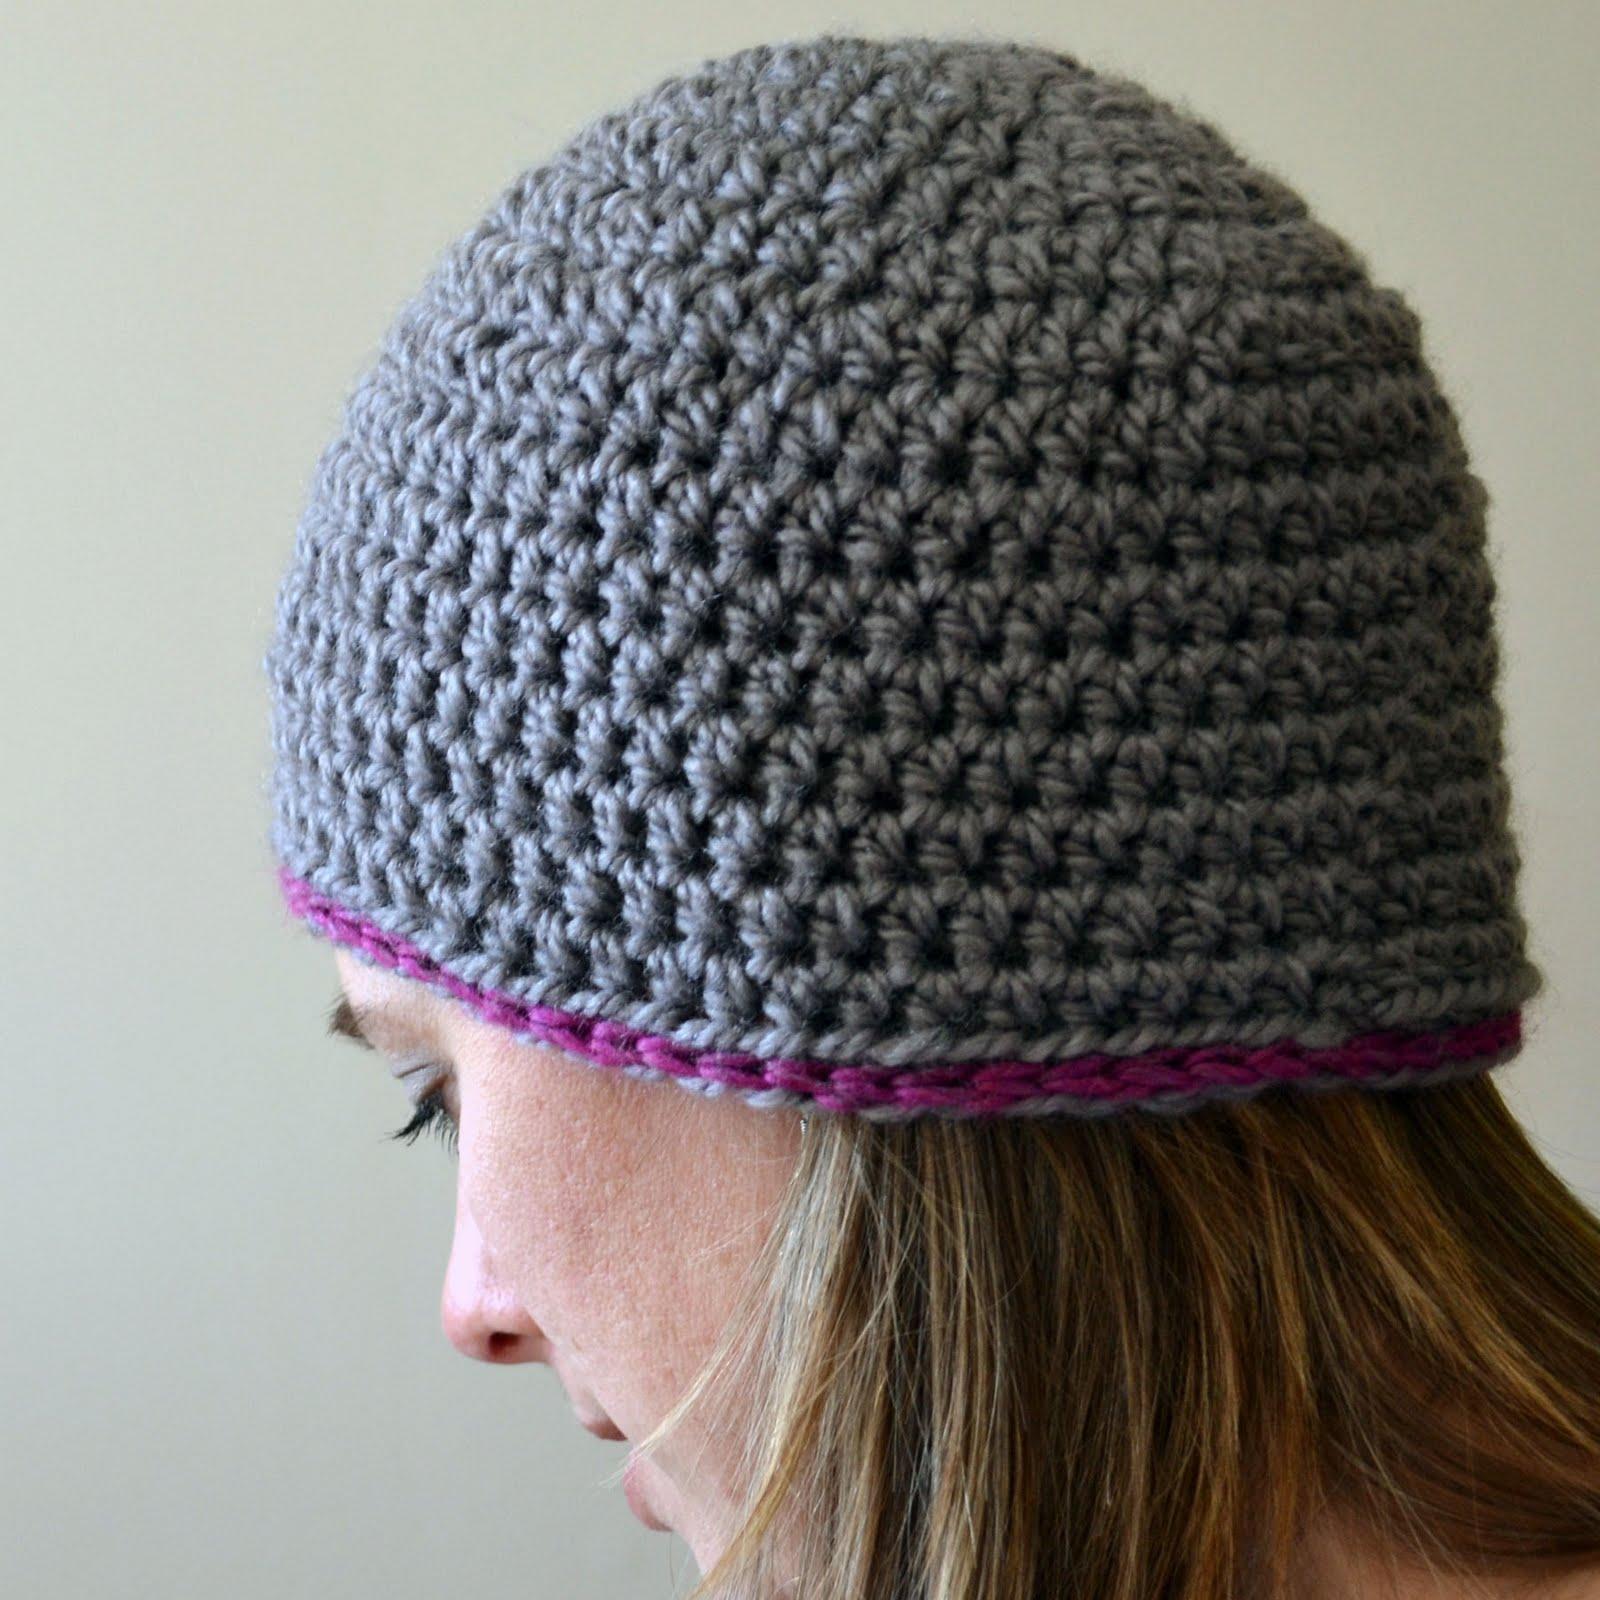 Beanie crochet pattern- Perfect for beginners